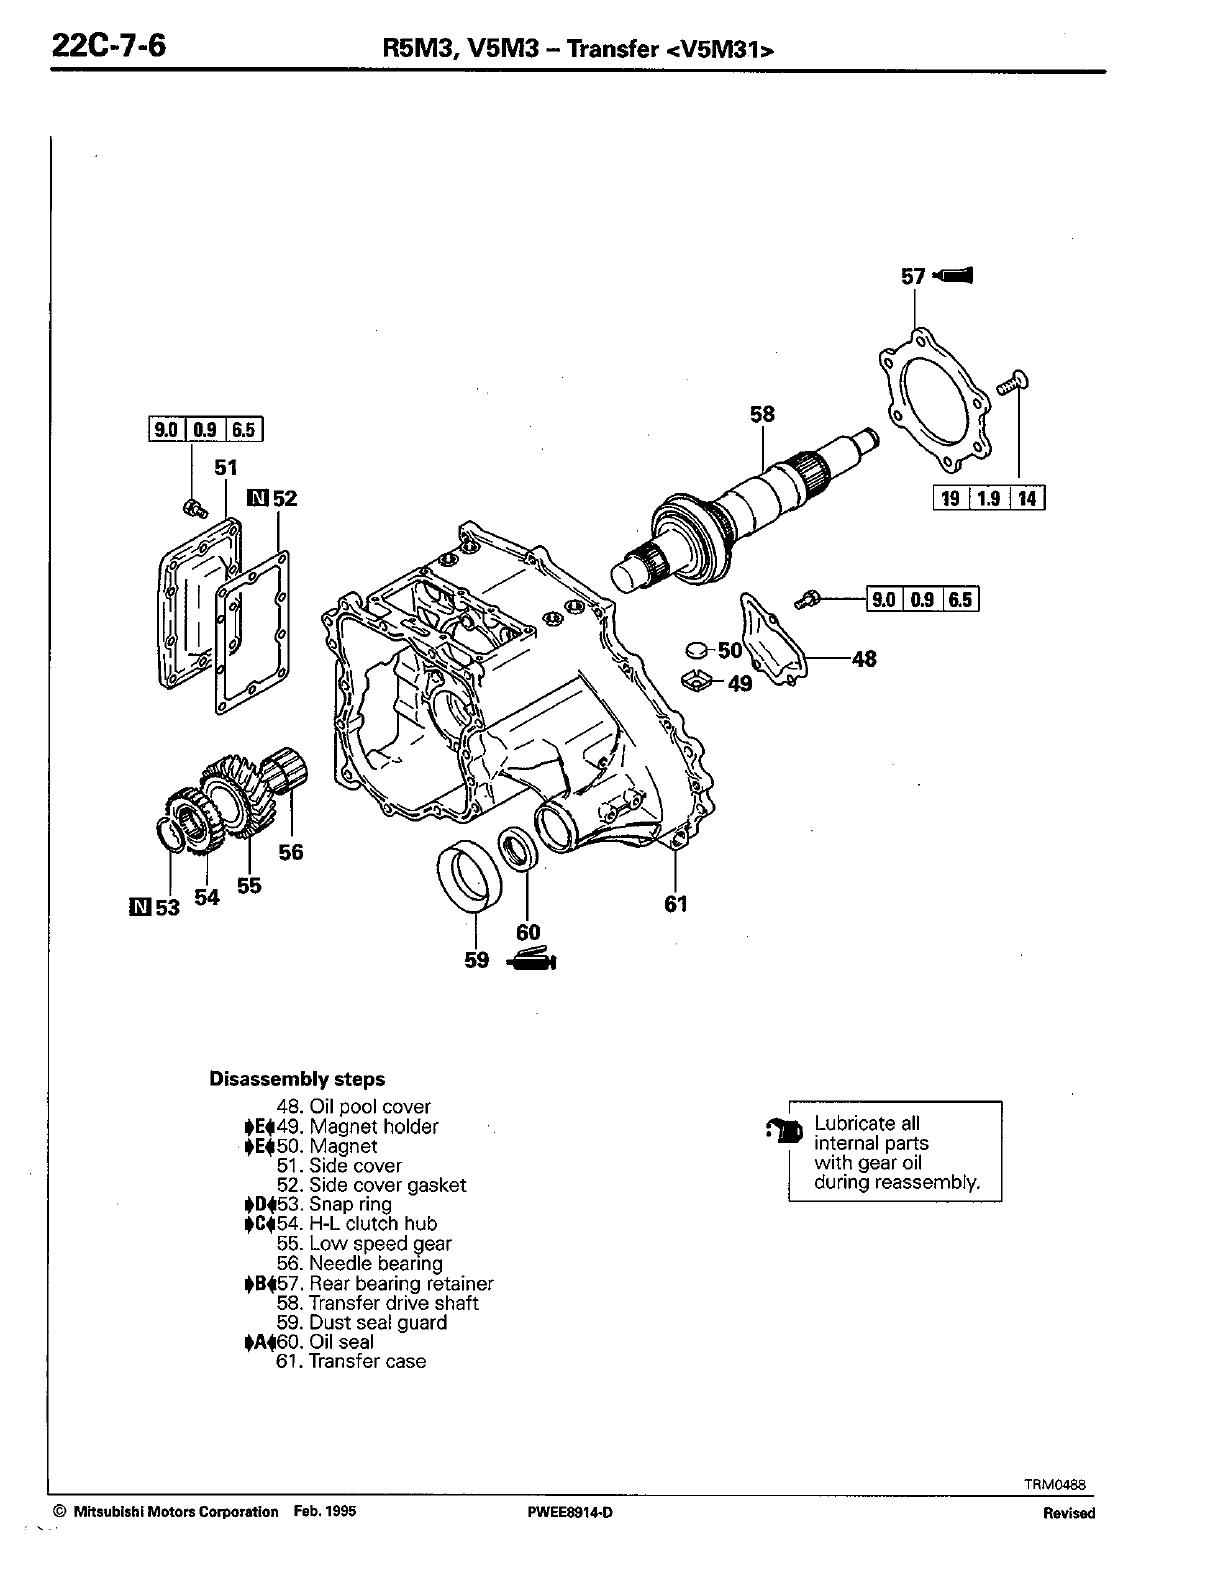 Mitsubishi Motors Automobile R5M3 Users Manual